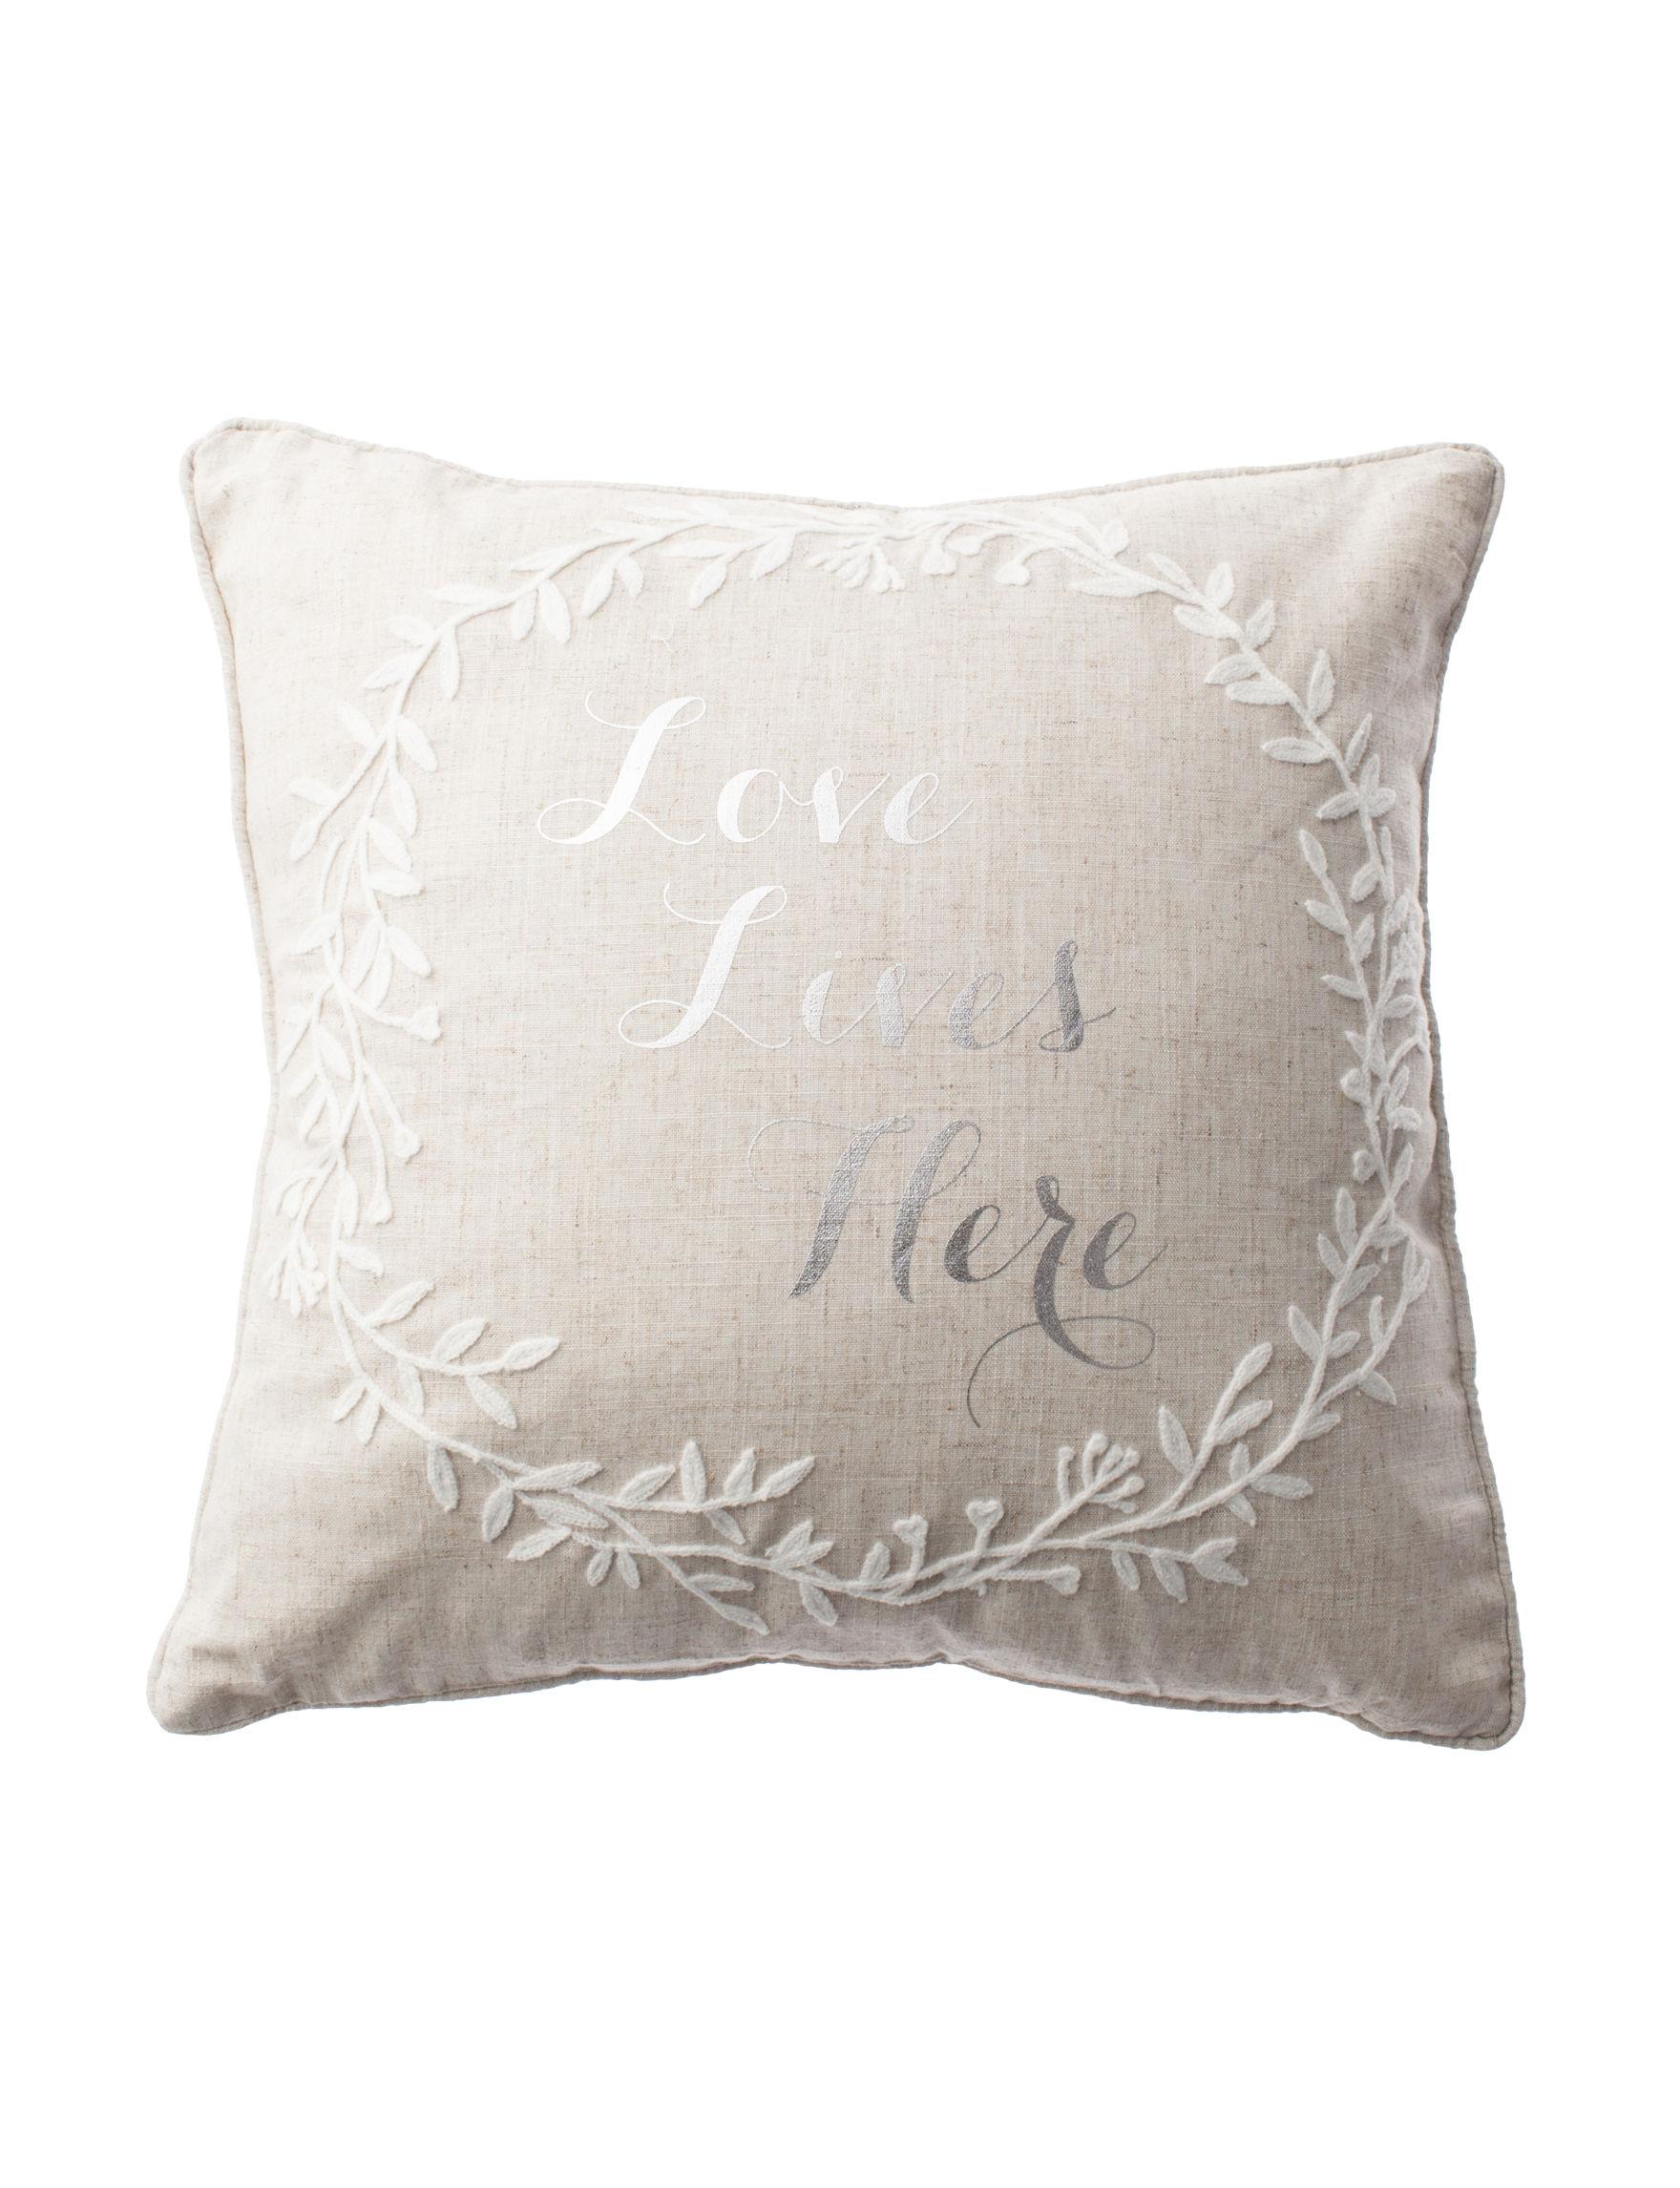 Deco Grey Decorative Pillows